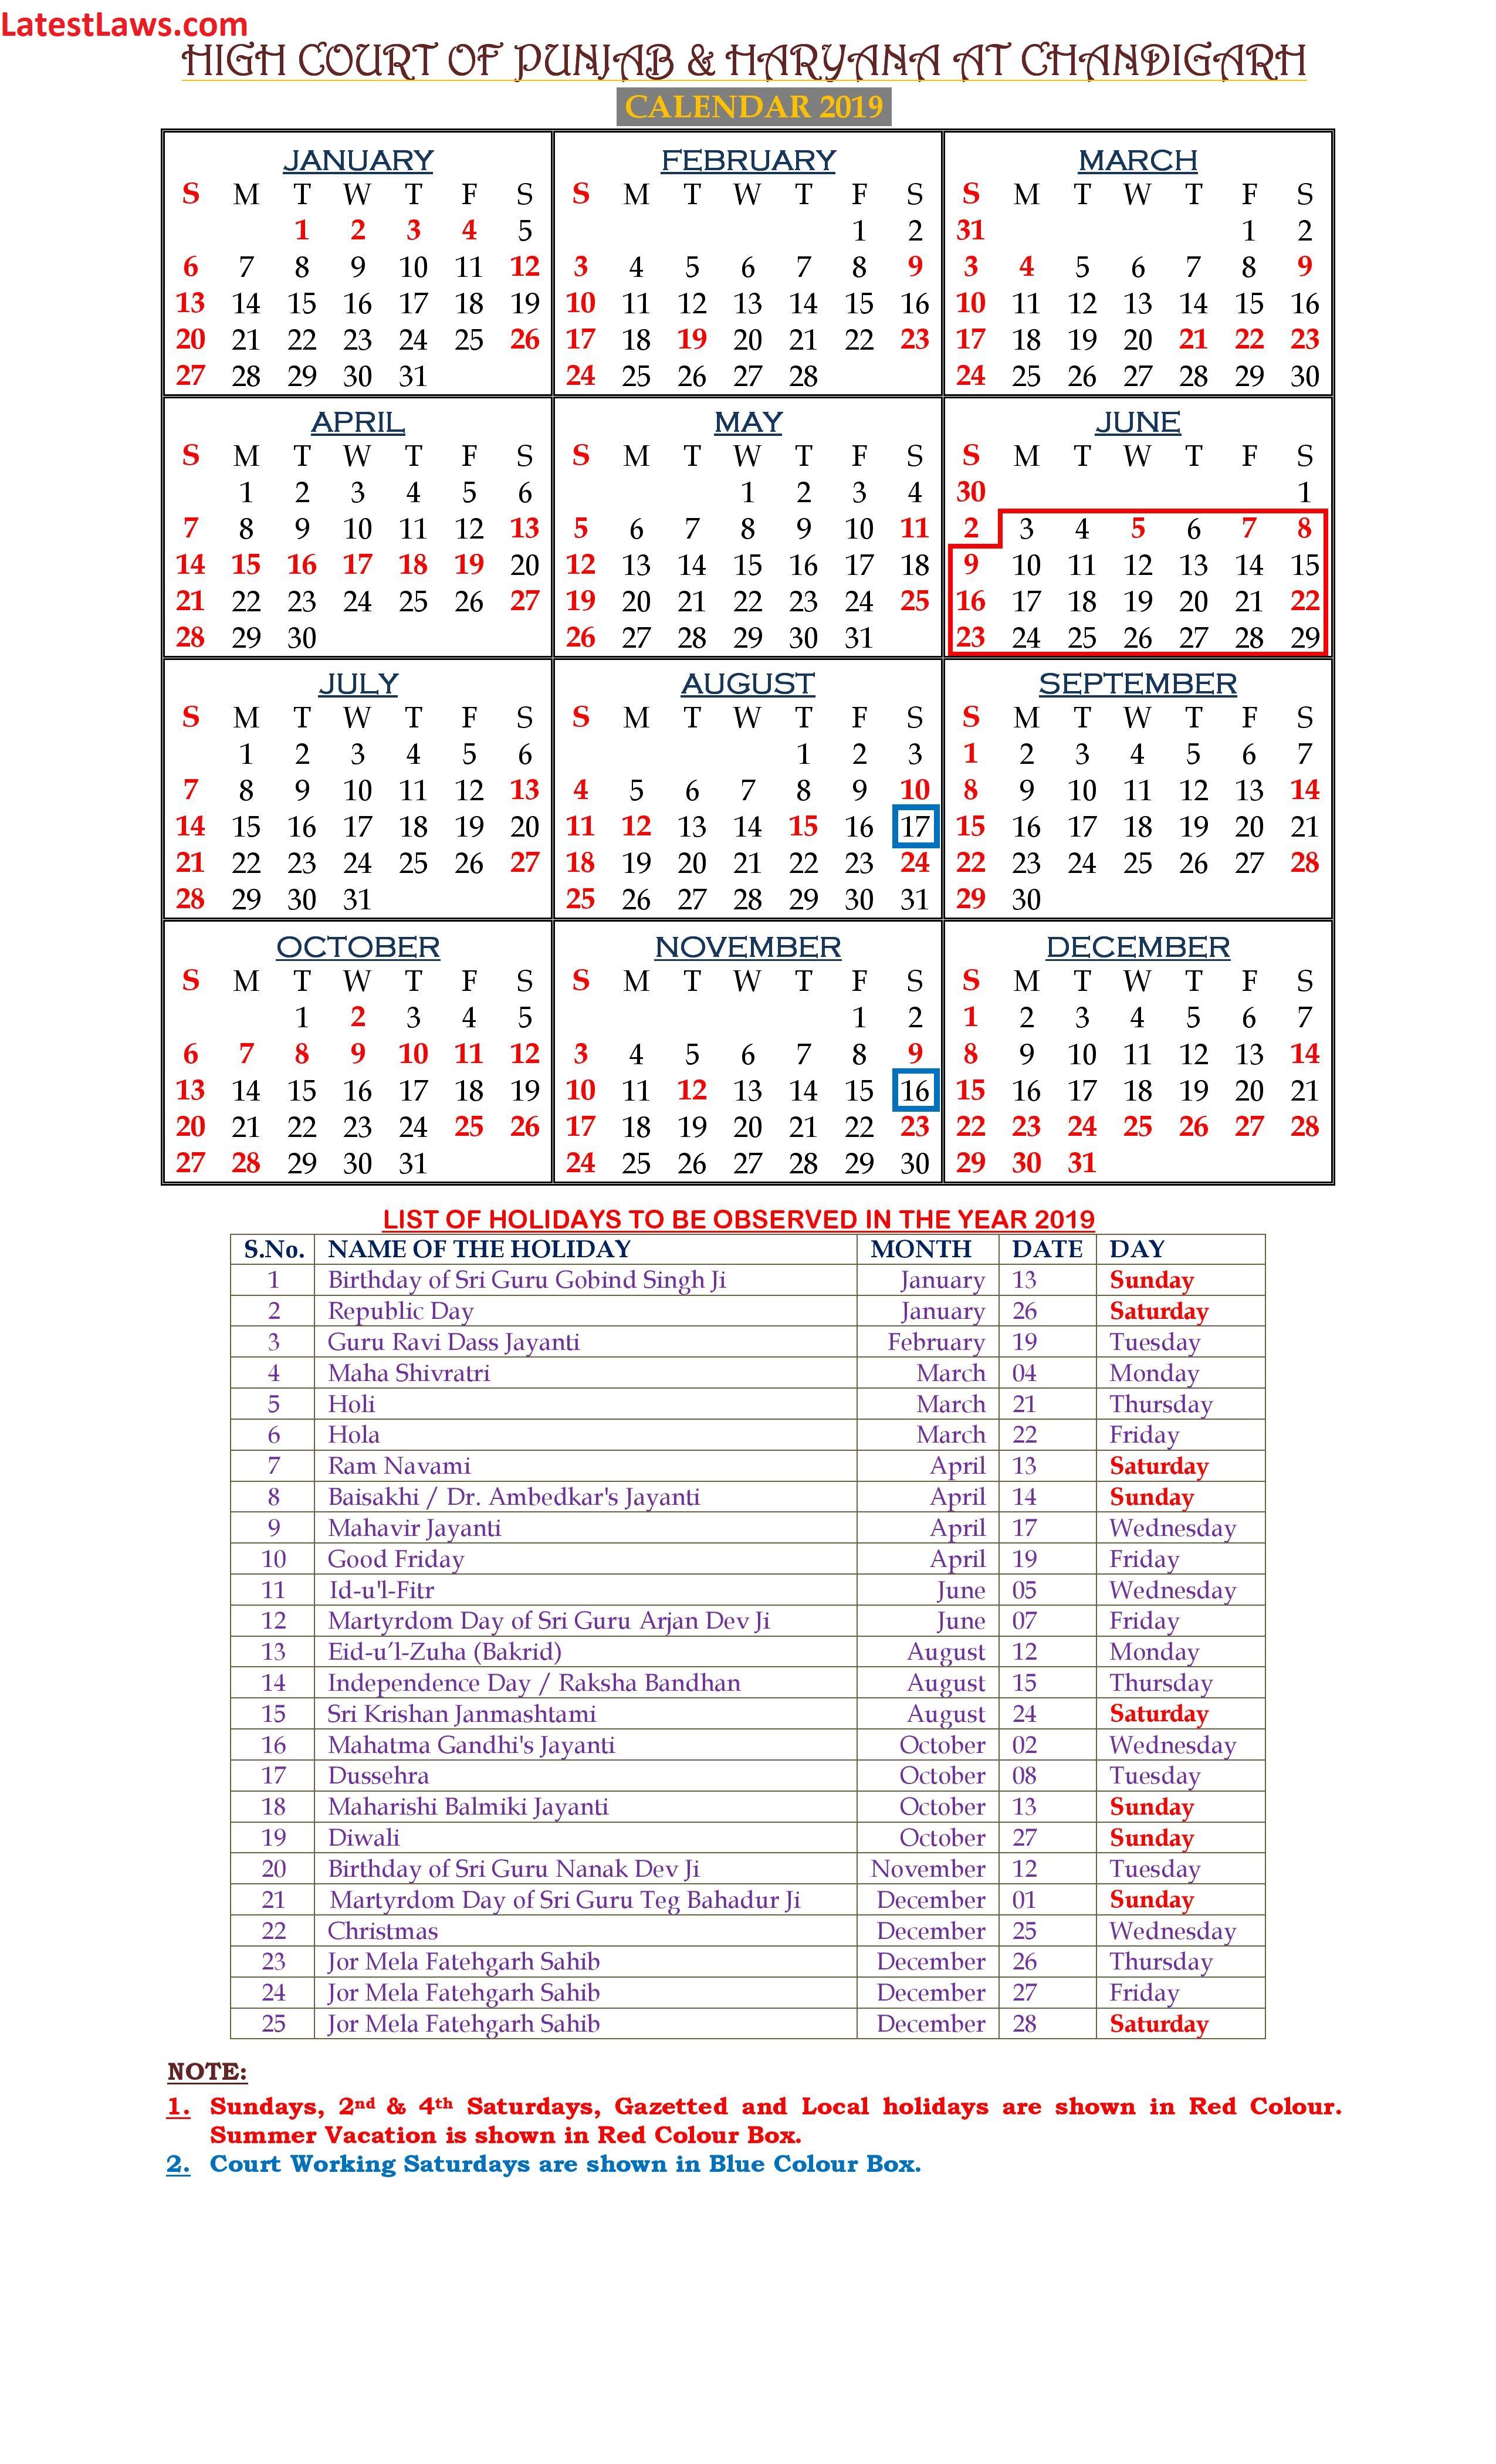 Haryana And Punjab High Court Calendar 2019 Regarding Lex Dist 1 Calendar